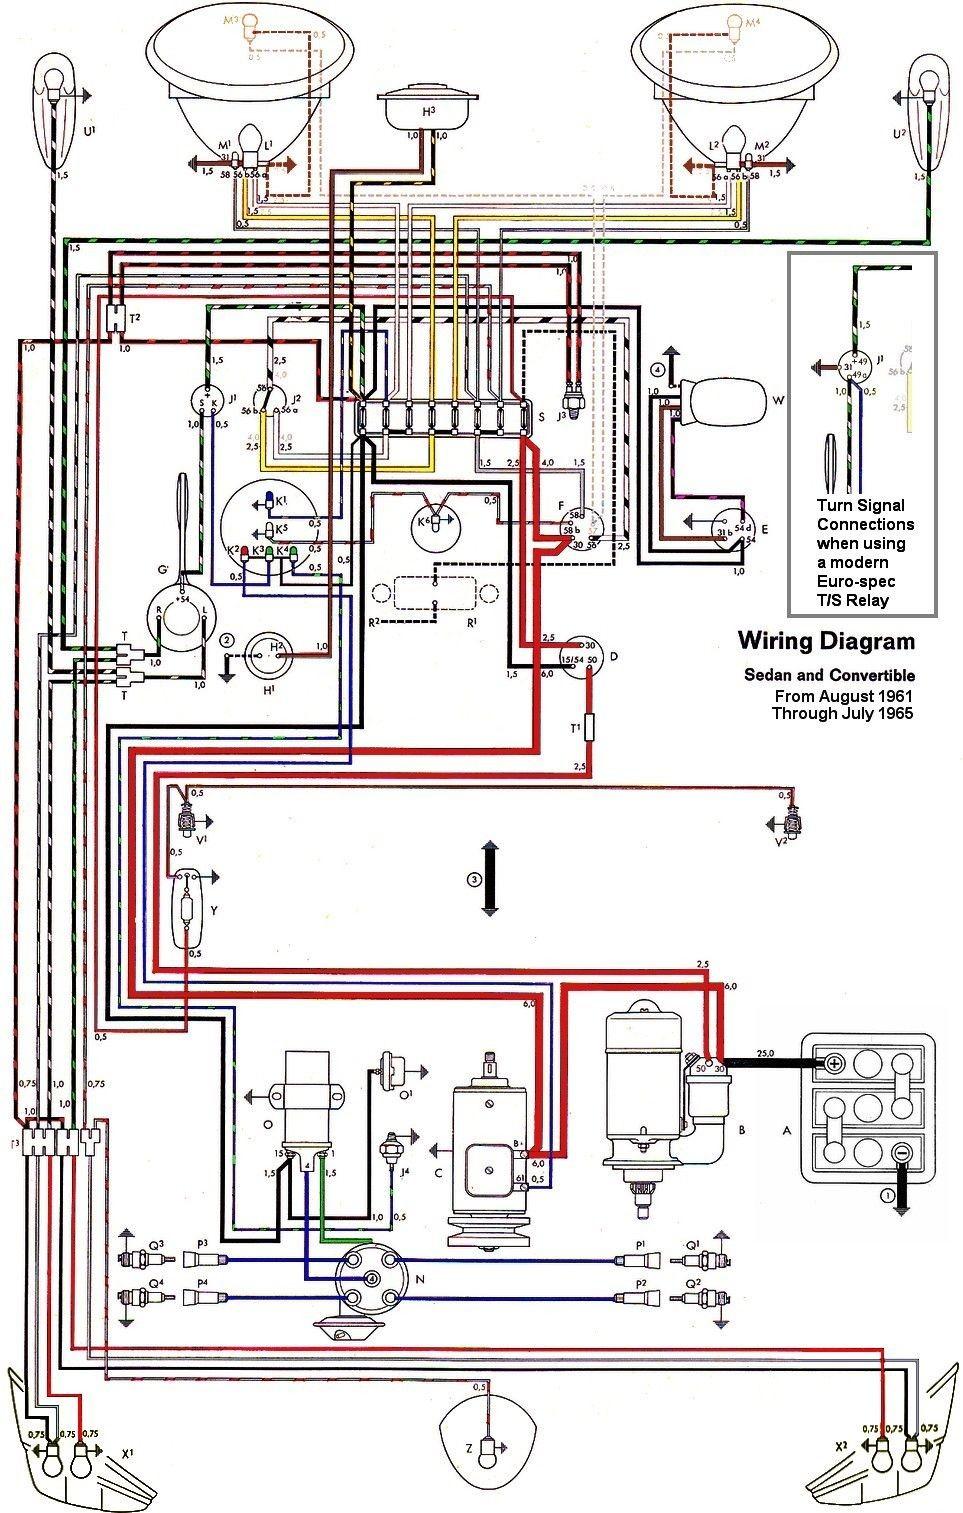 1970 vw beetle wiring diagram inspirational wiring diagram image rh  mainetreasurechest com Basic Turn Signal Wiring